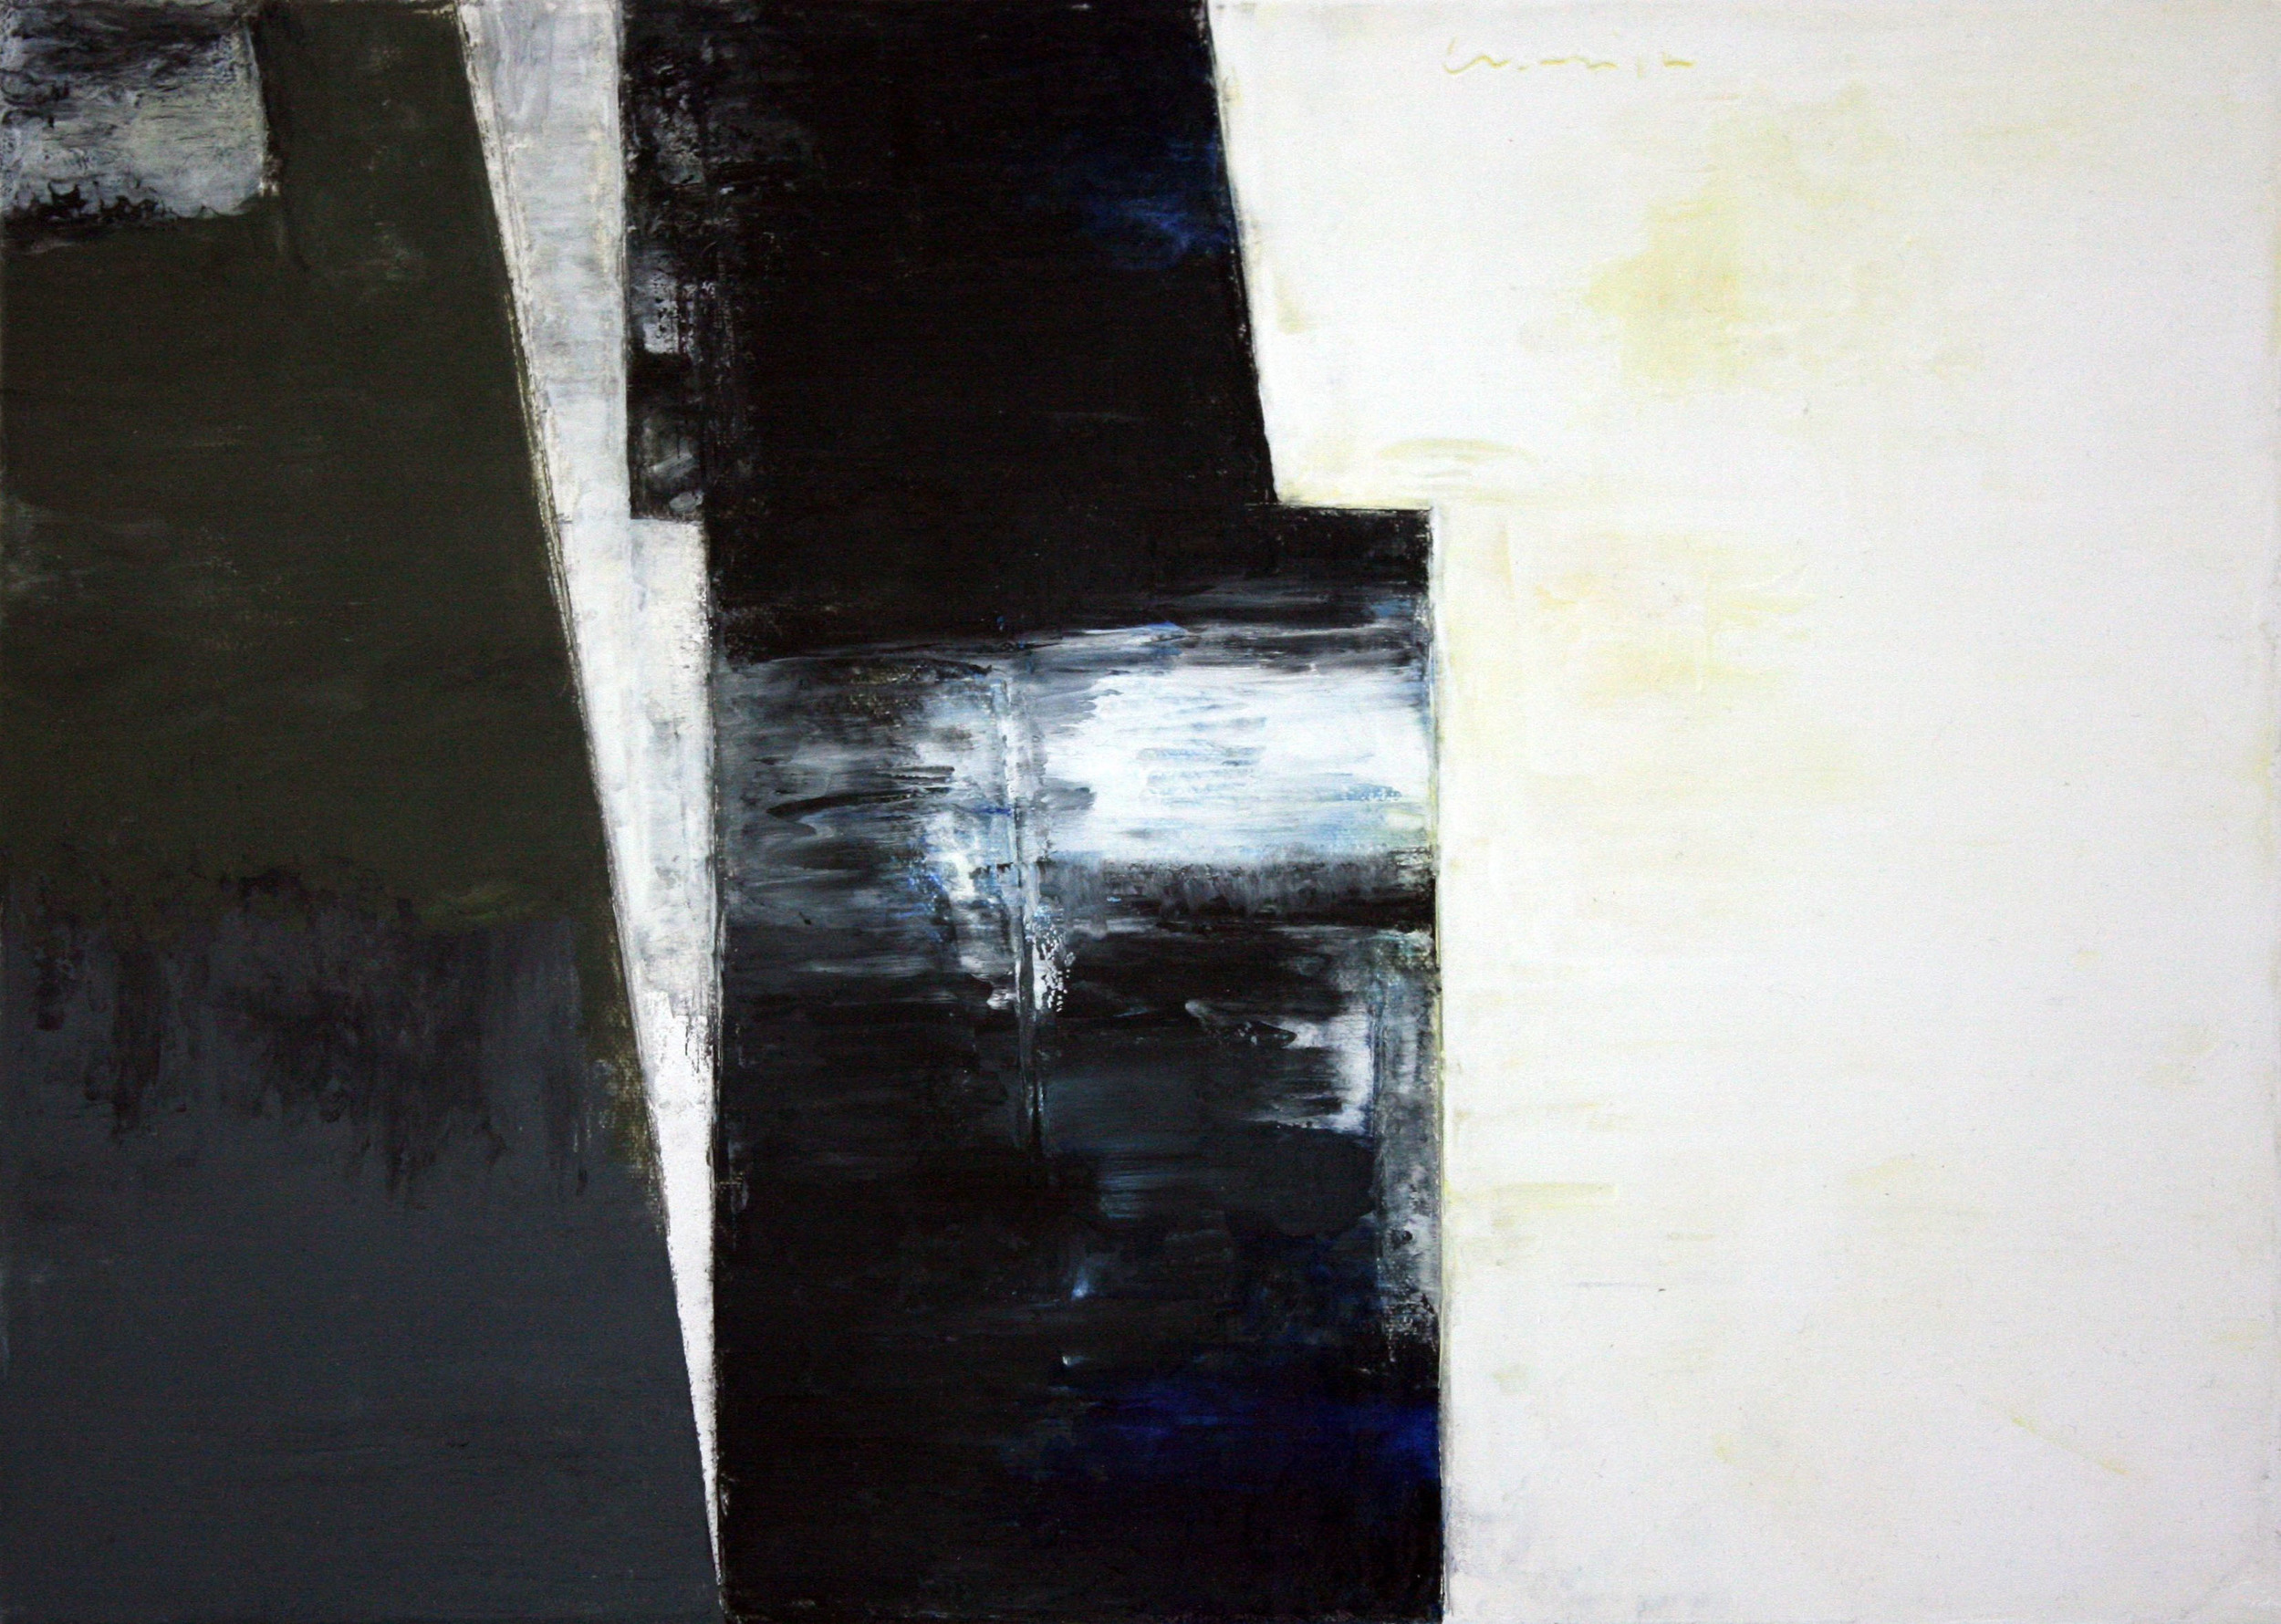 Envoi #1  , 2014 oil on canvas, 12 x 16 inches